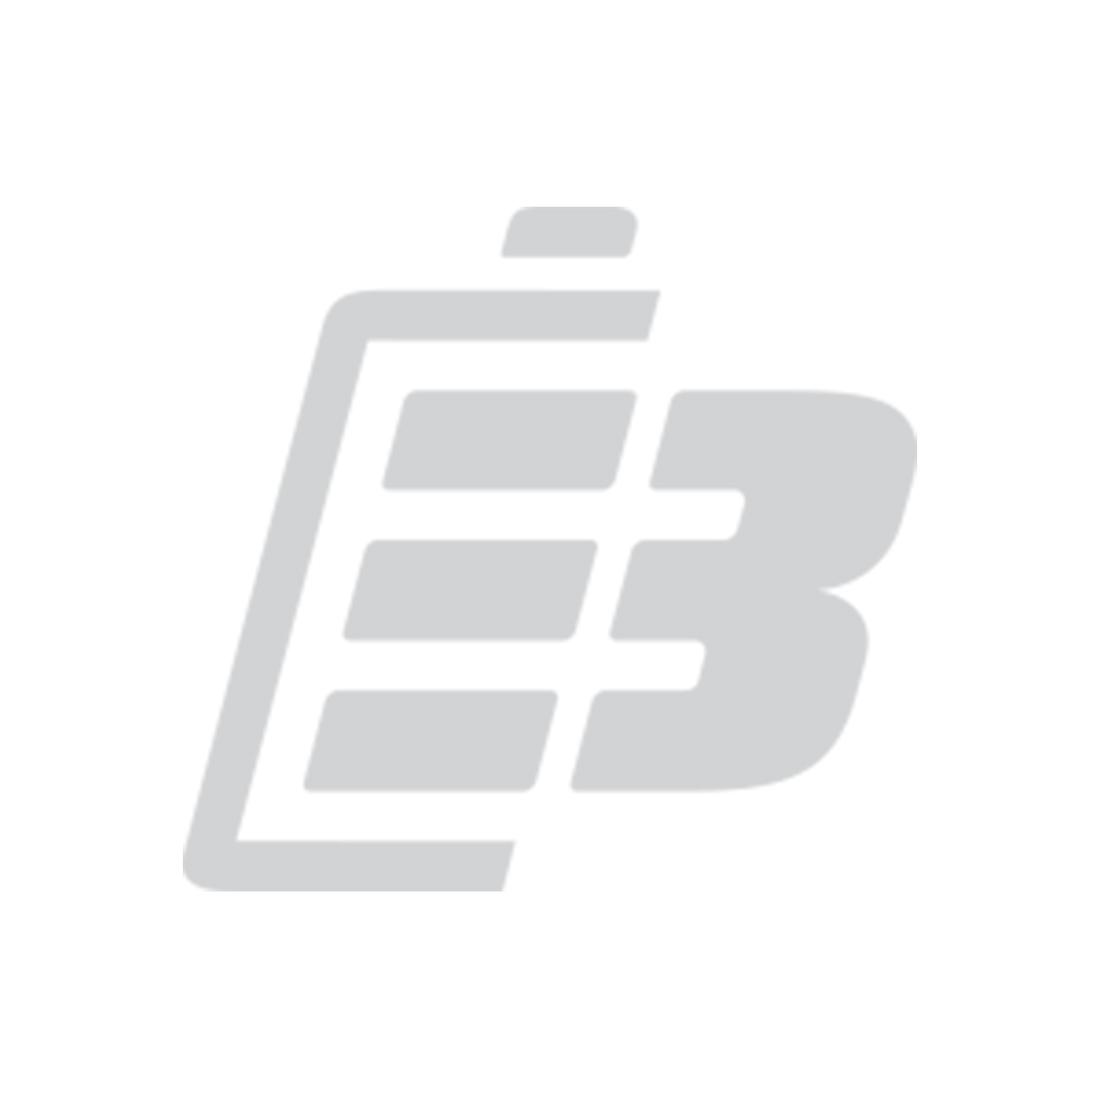 CR2320 Lithium battery Varta 3V